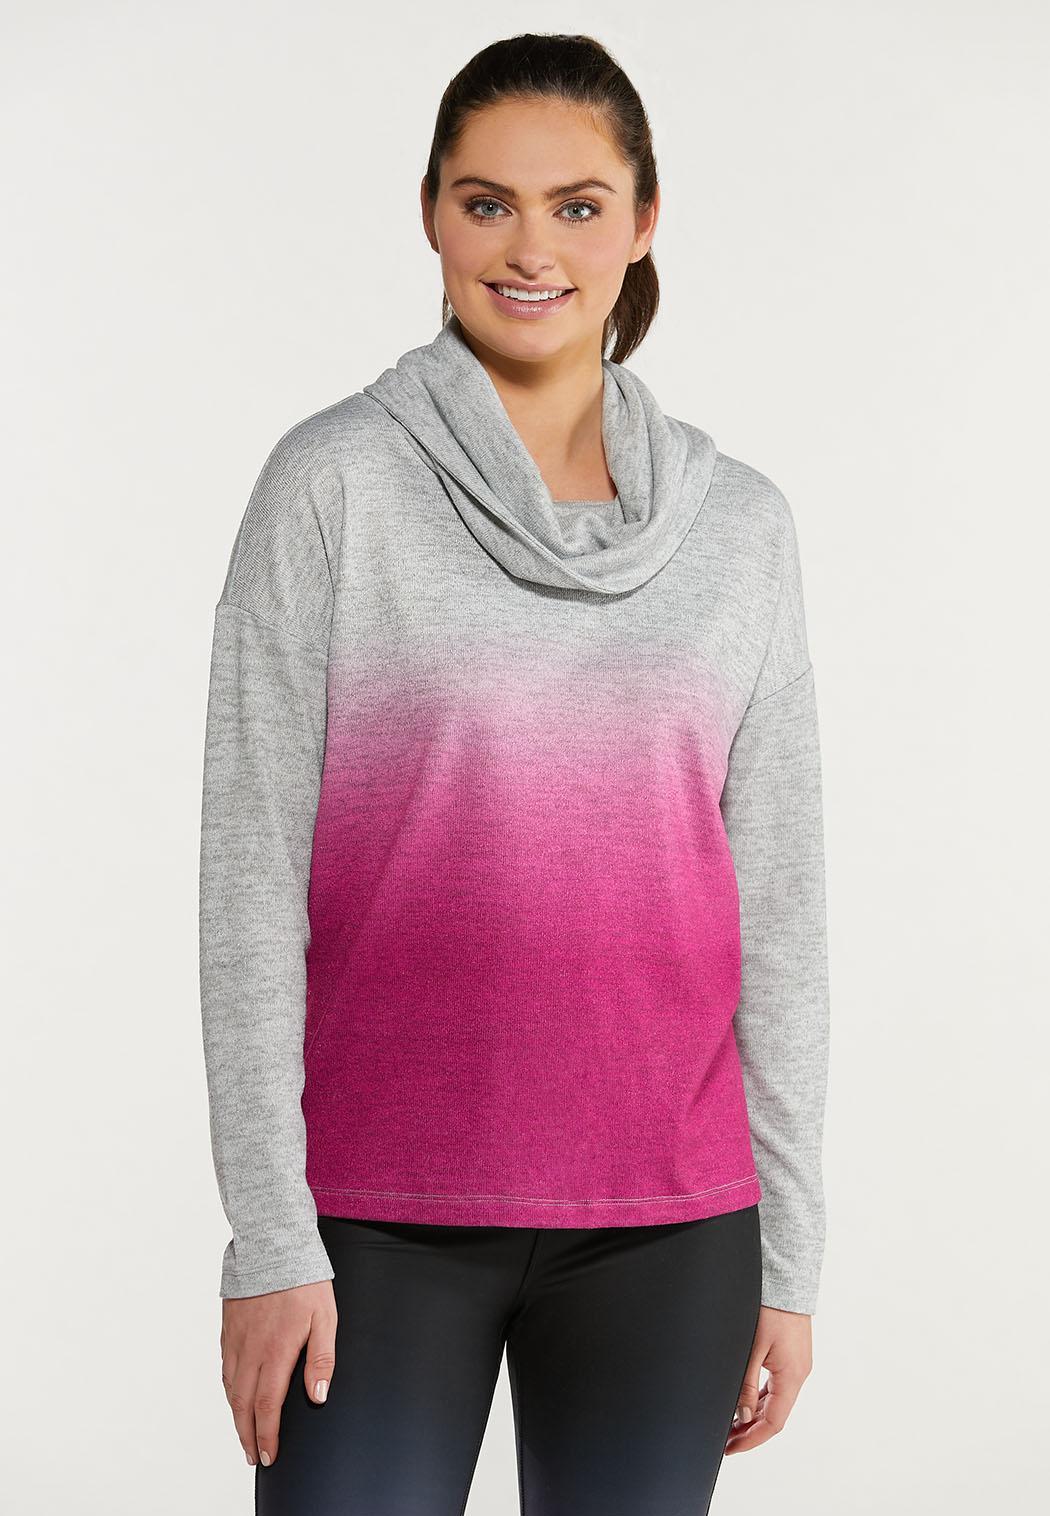 Raspberry Dye Cowl Neck Top